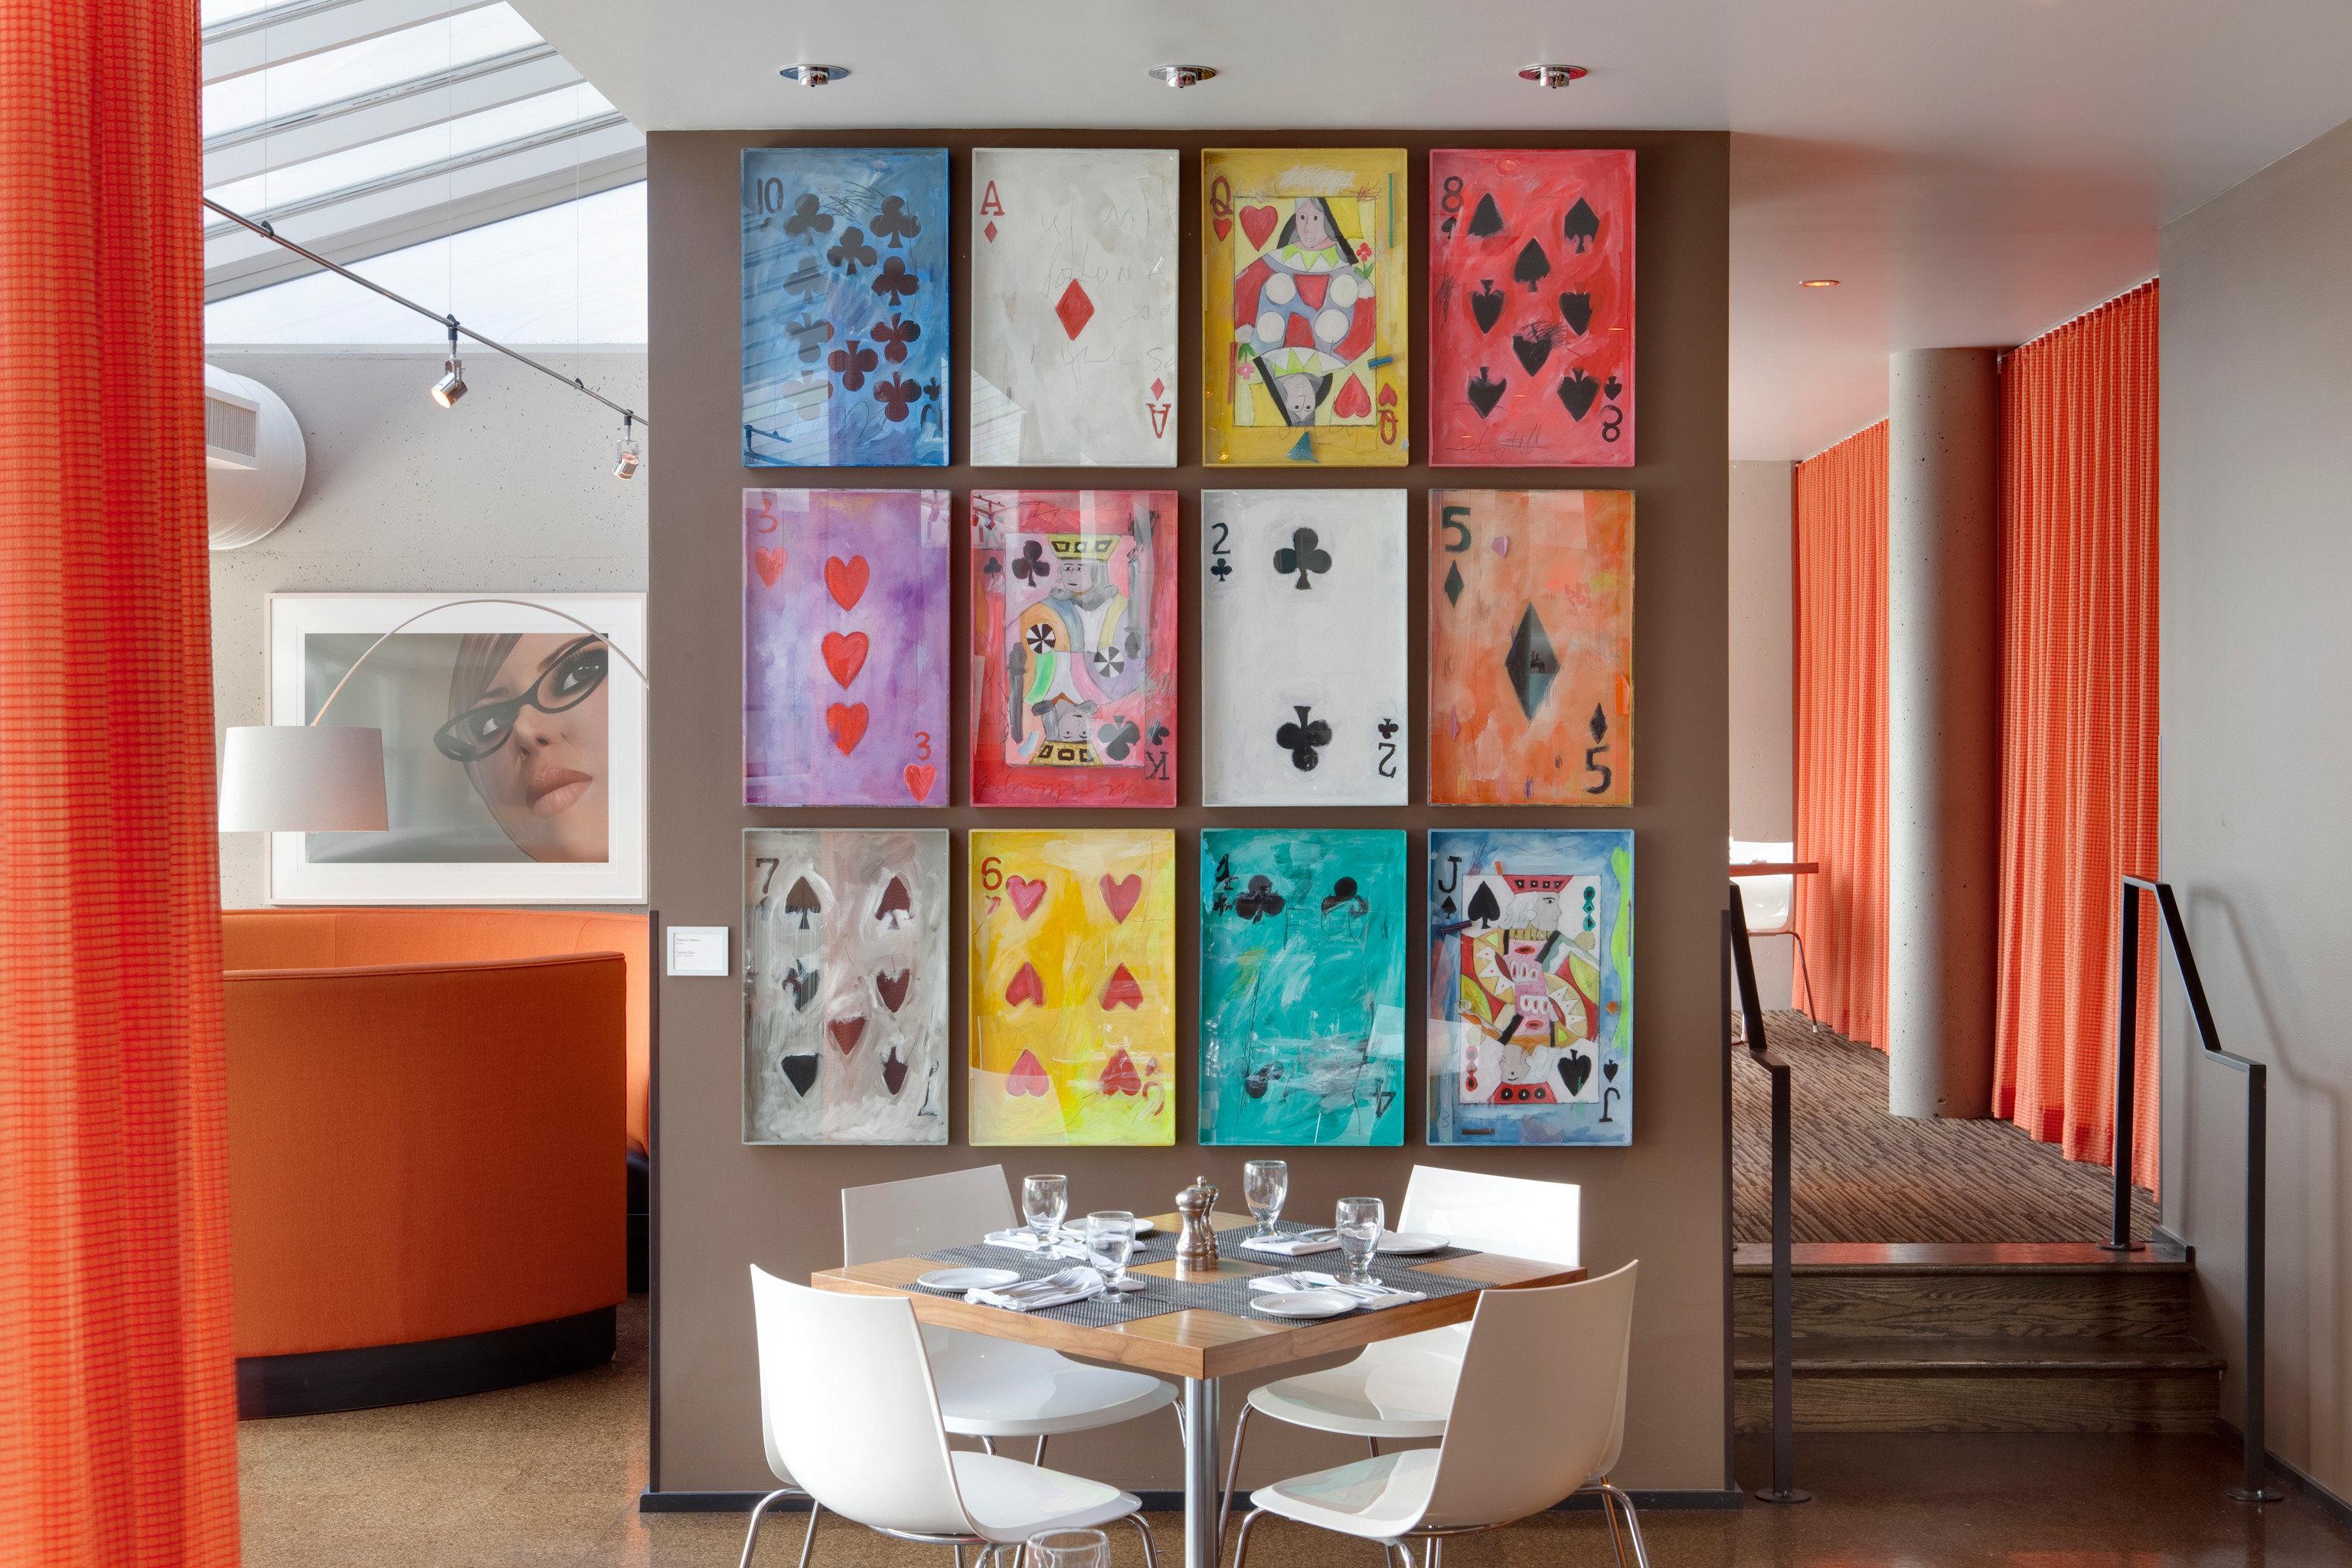 Bar Boutique Budget City Dining Drink Eat Hip Lounge Modern living room red art home office orange